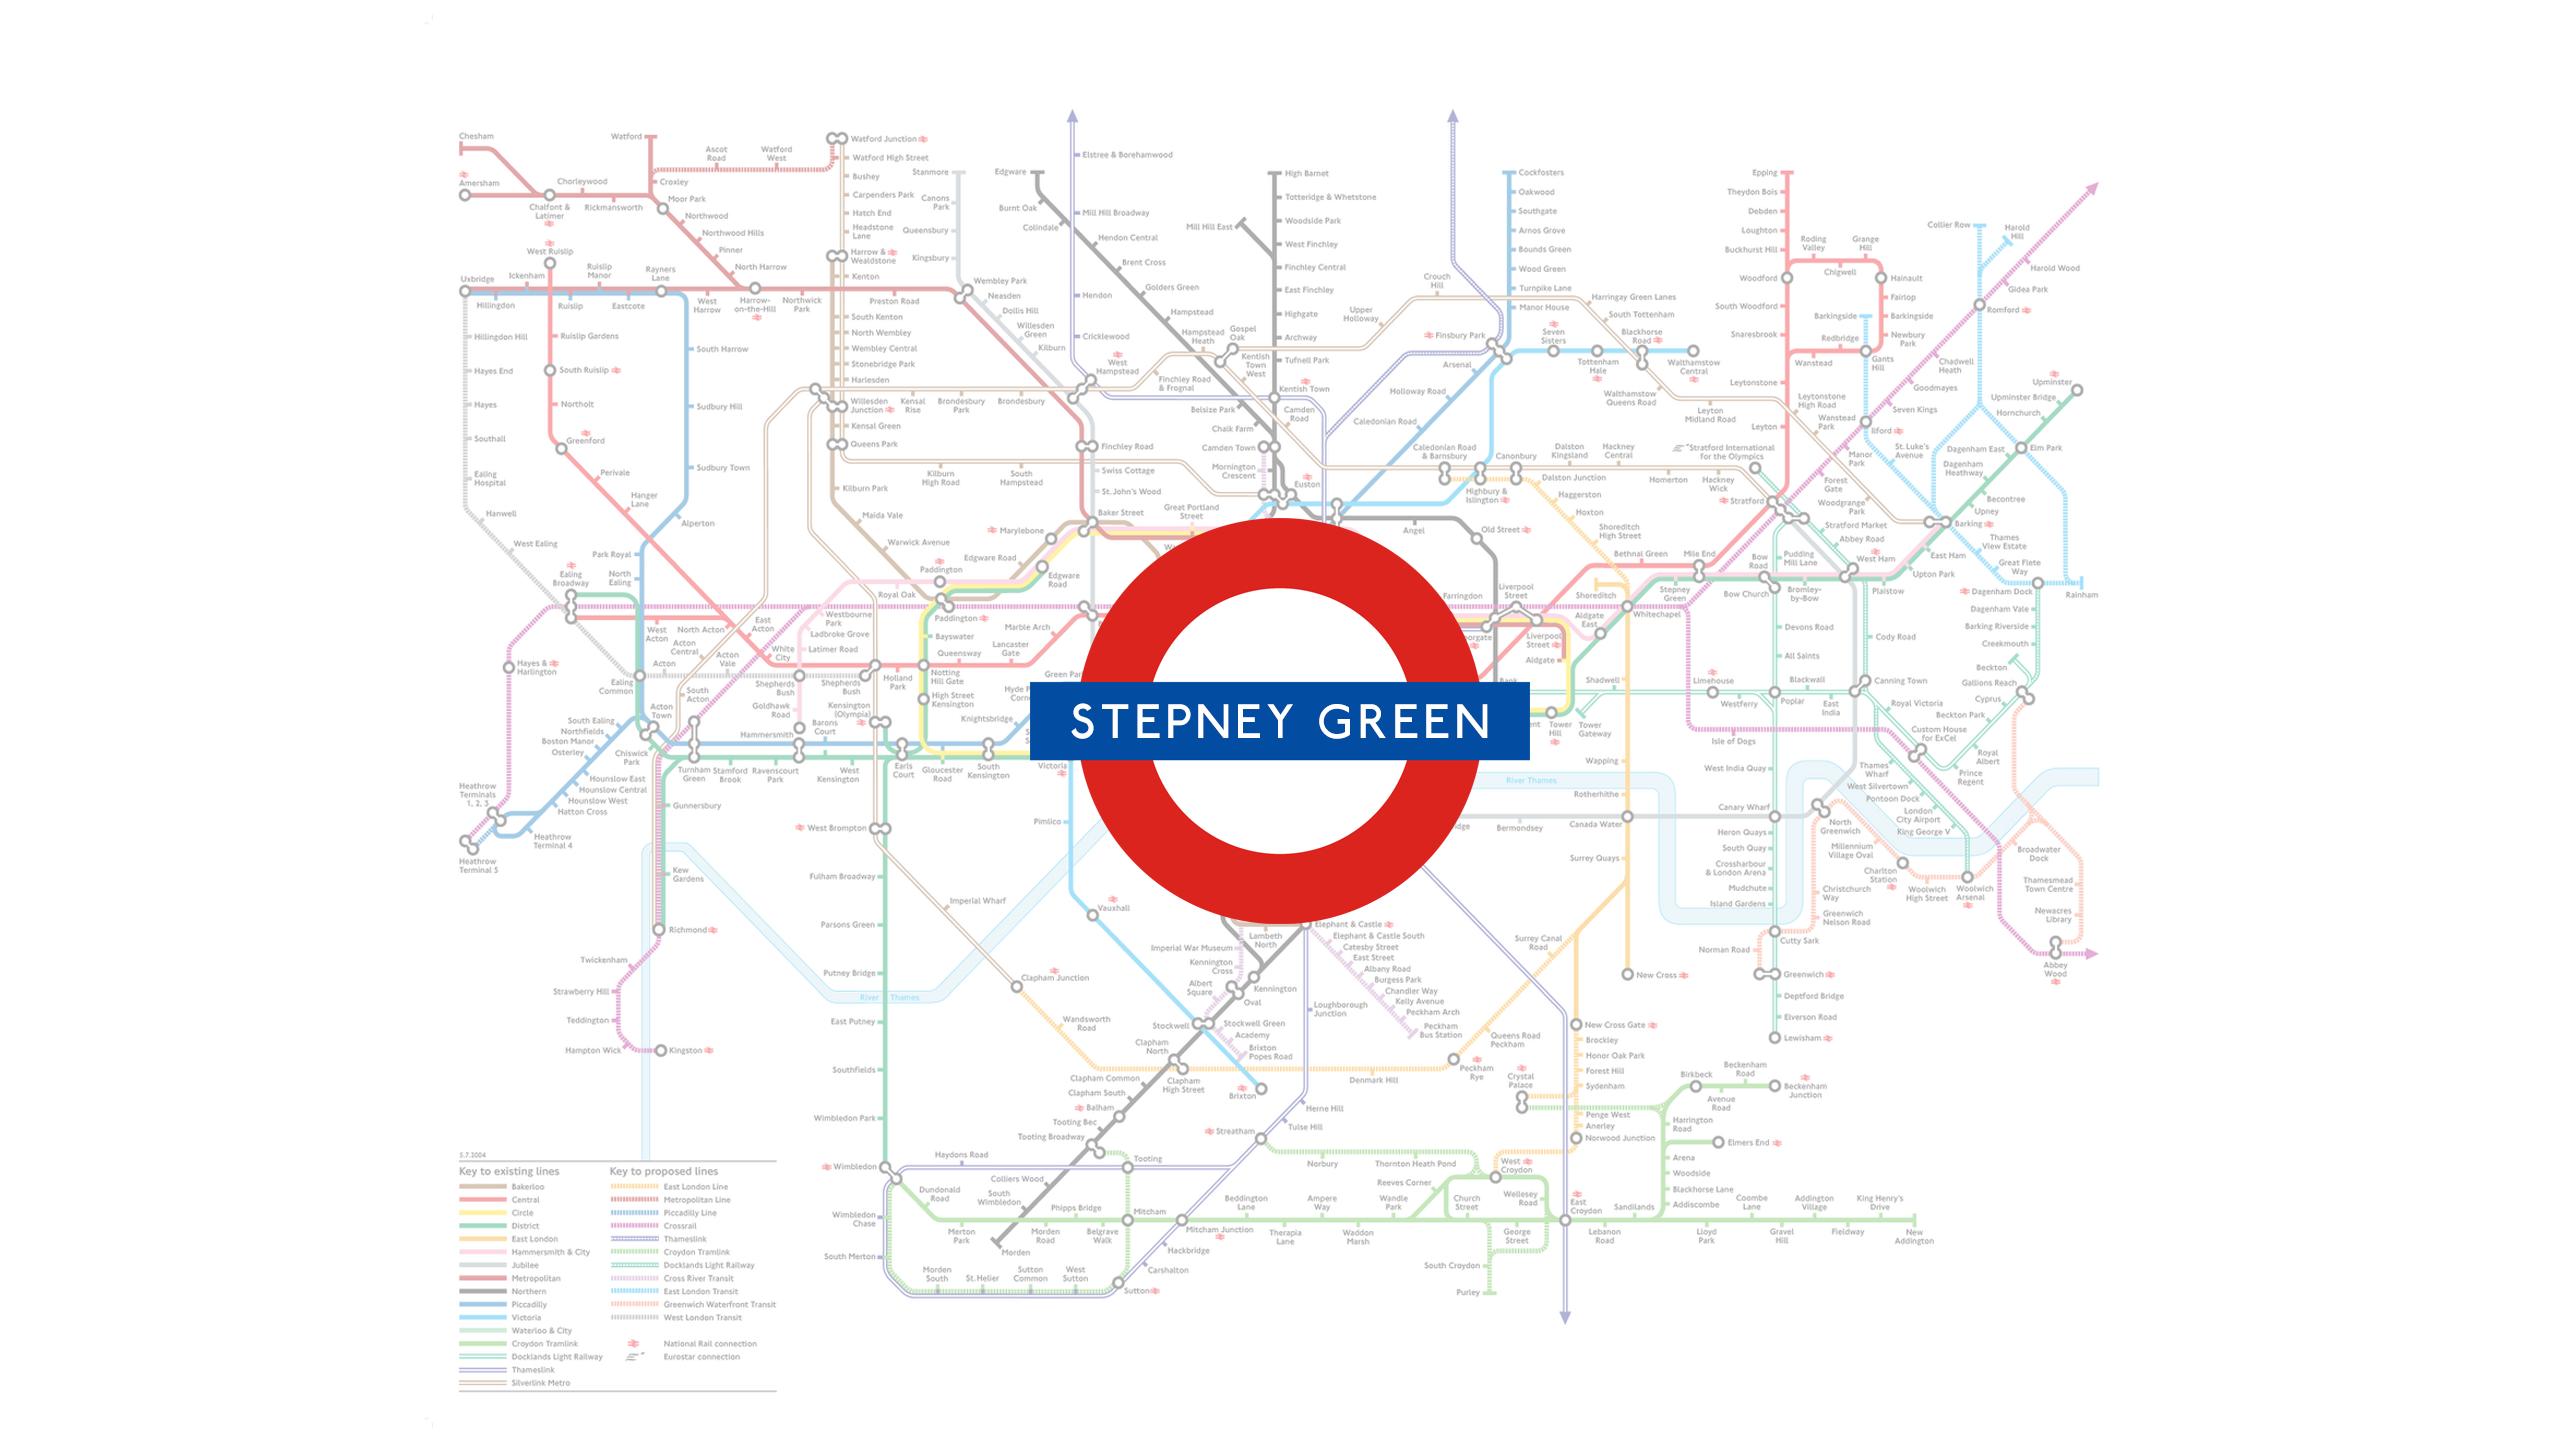 Stepney Green (Map)